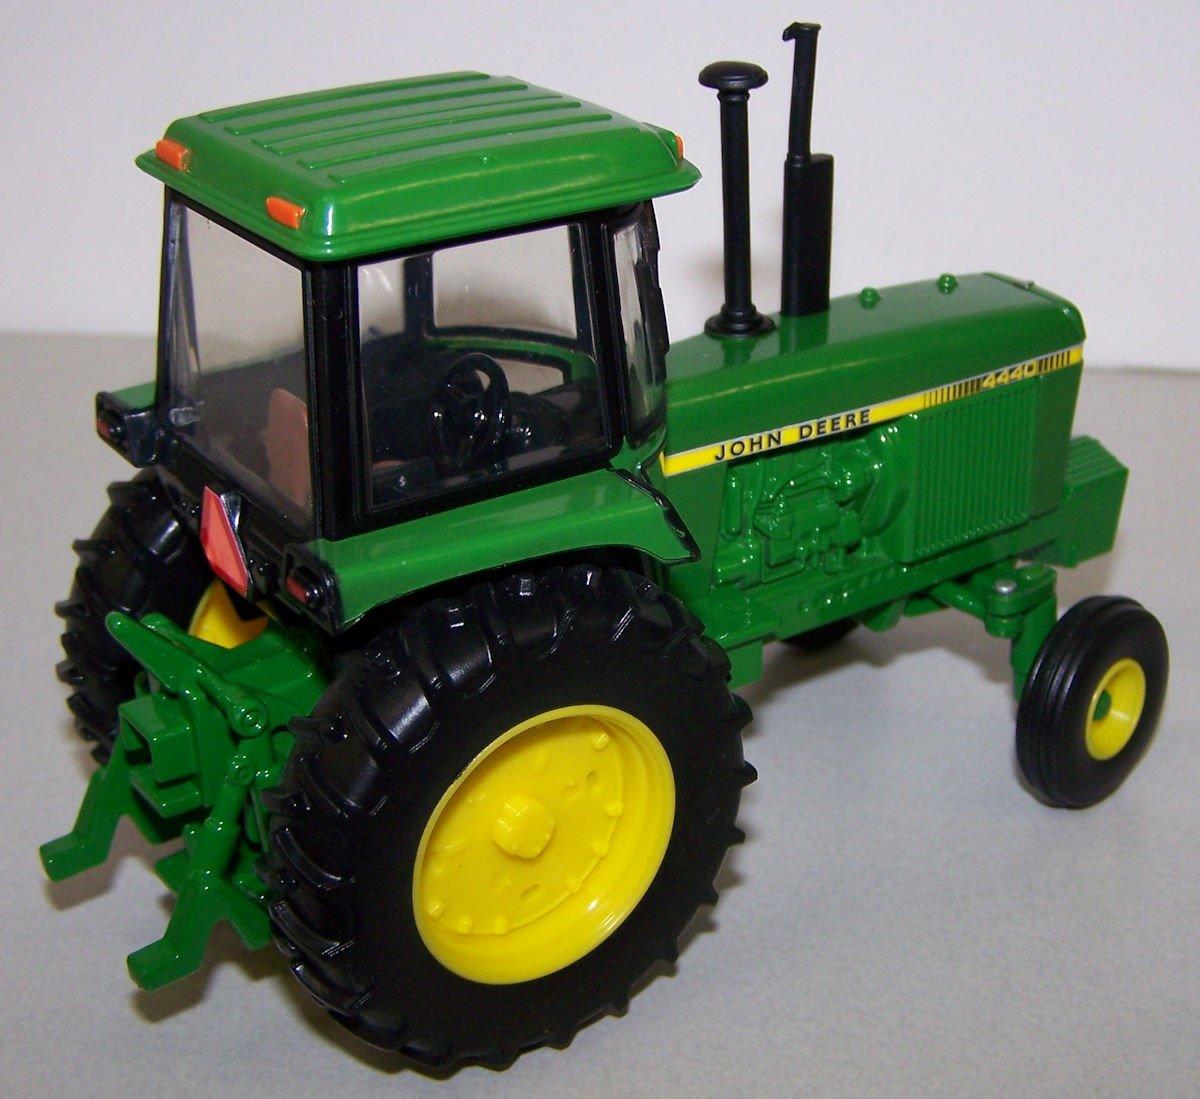 45548 1/32 John Deere 4440 Tractor | Action Toys